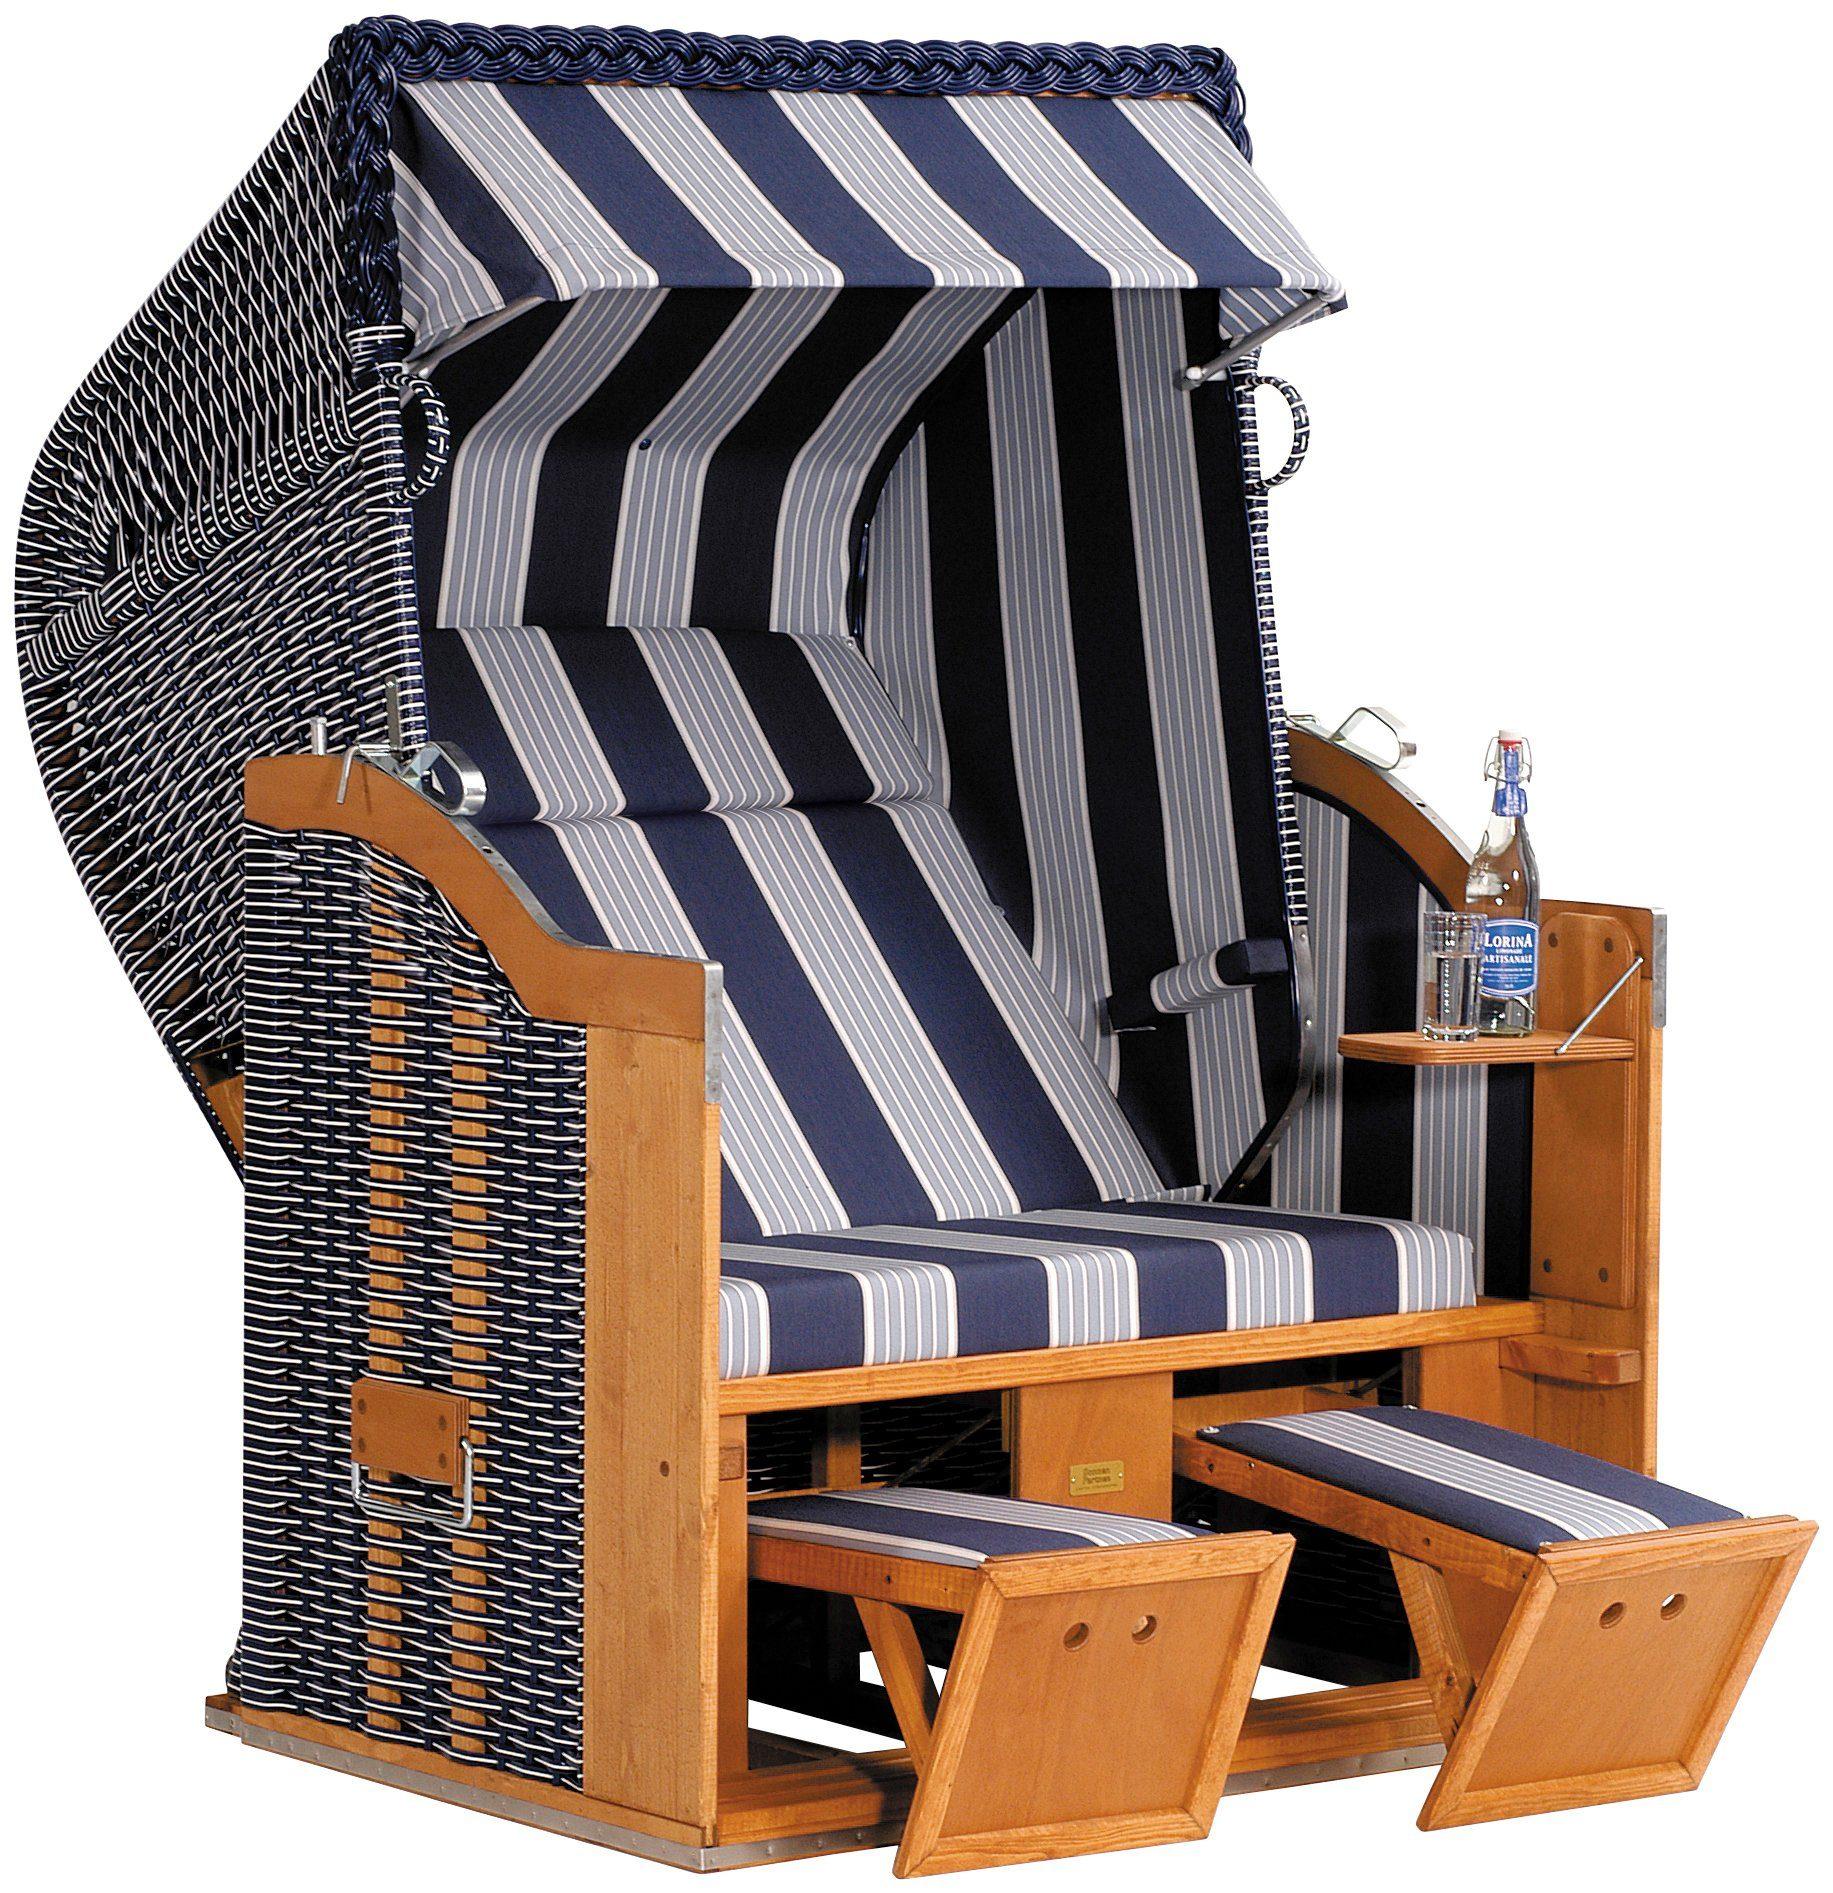 SONNEN PARTNER Strandkorb »Classic 118«, BxTxH: 130x90x160 cm, blau/weiß